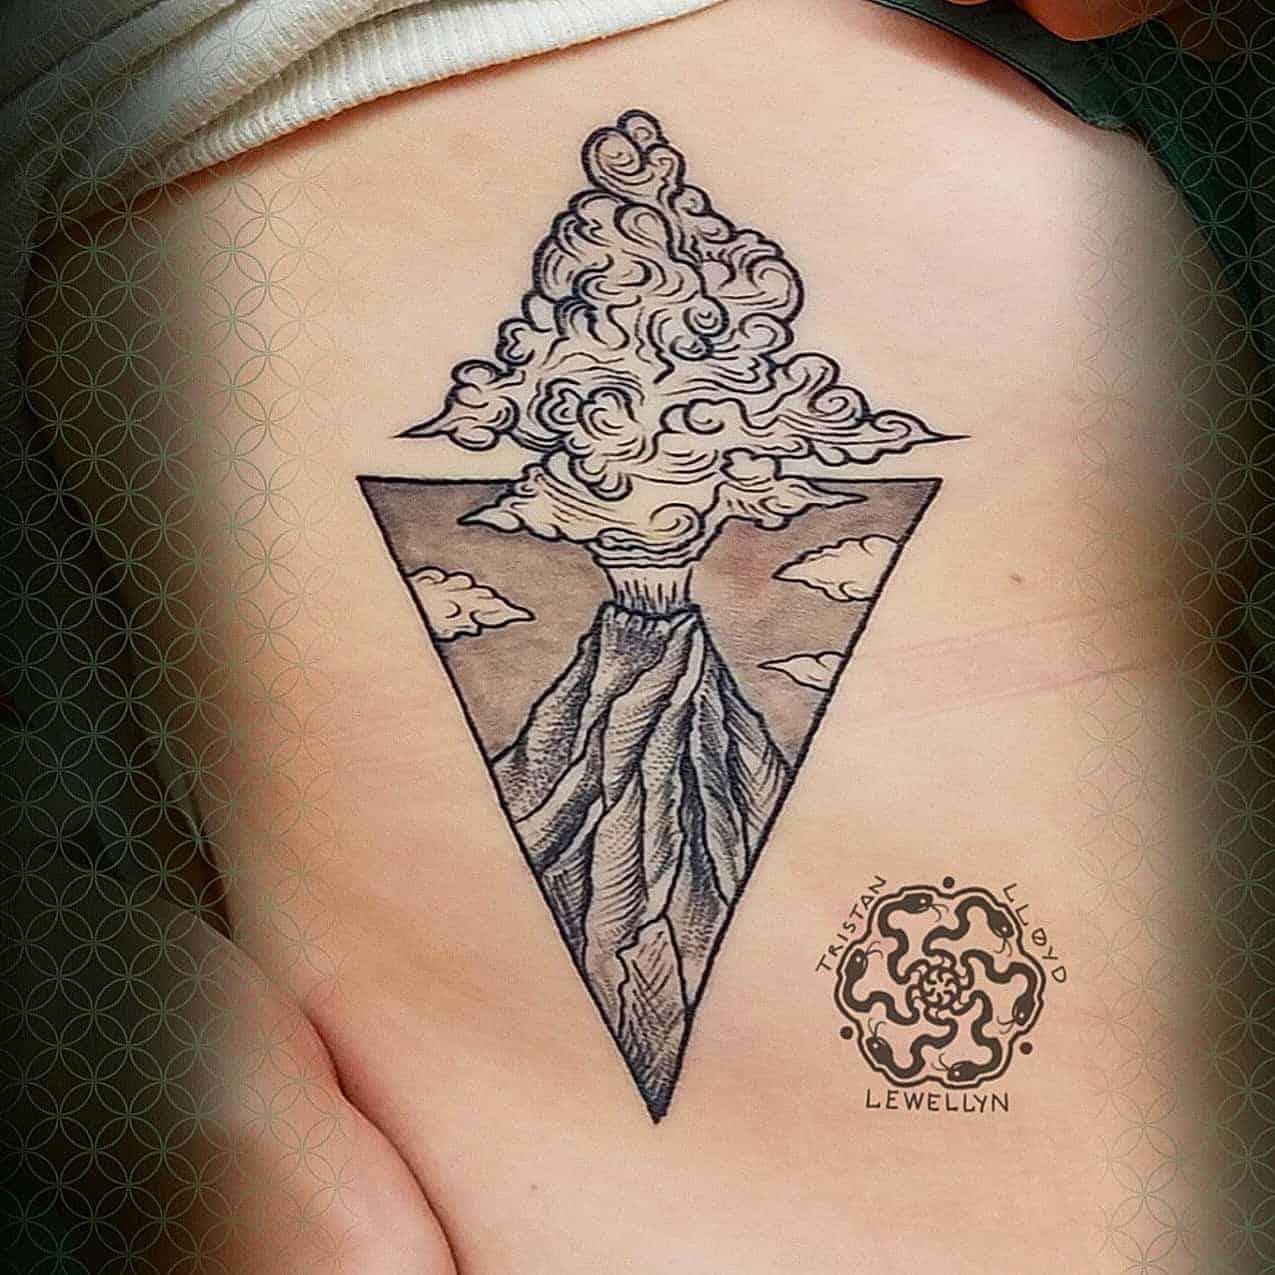 blackwork tattoo of a volcane on ribs